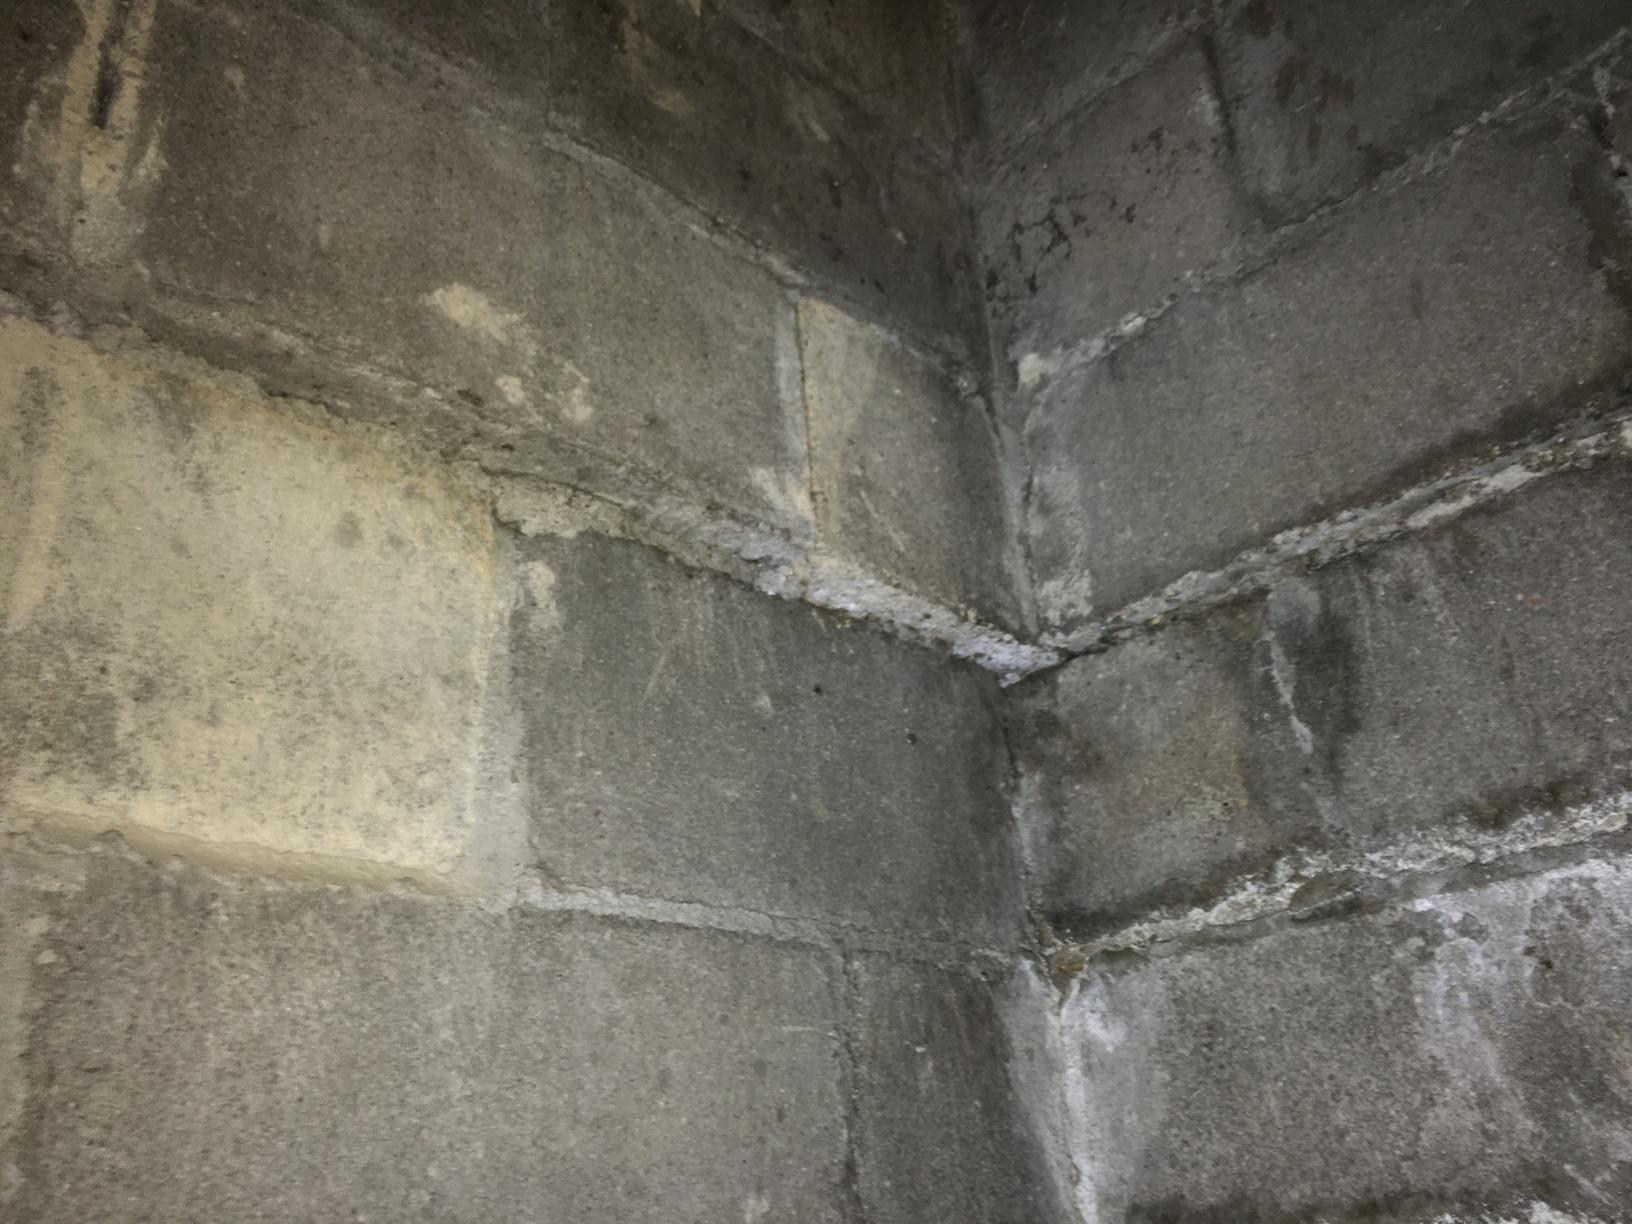 Bricks in Basement are not aligned